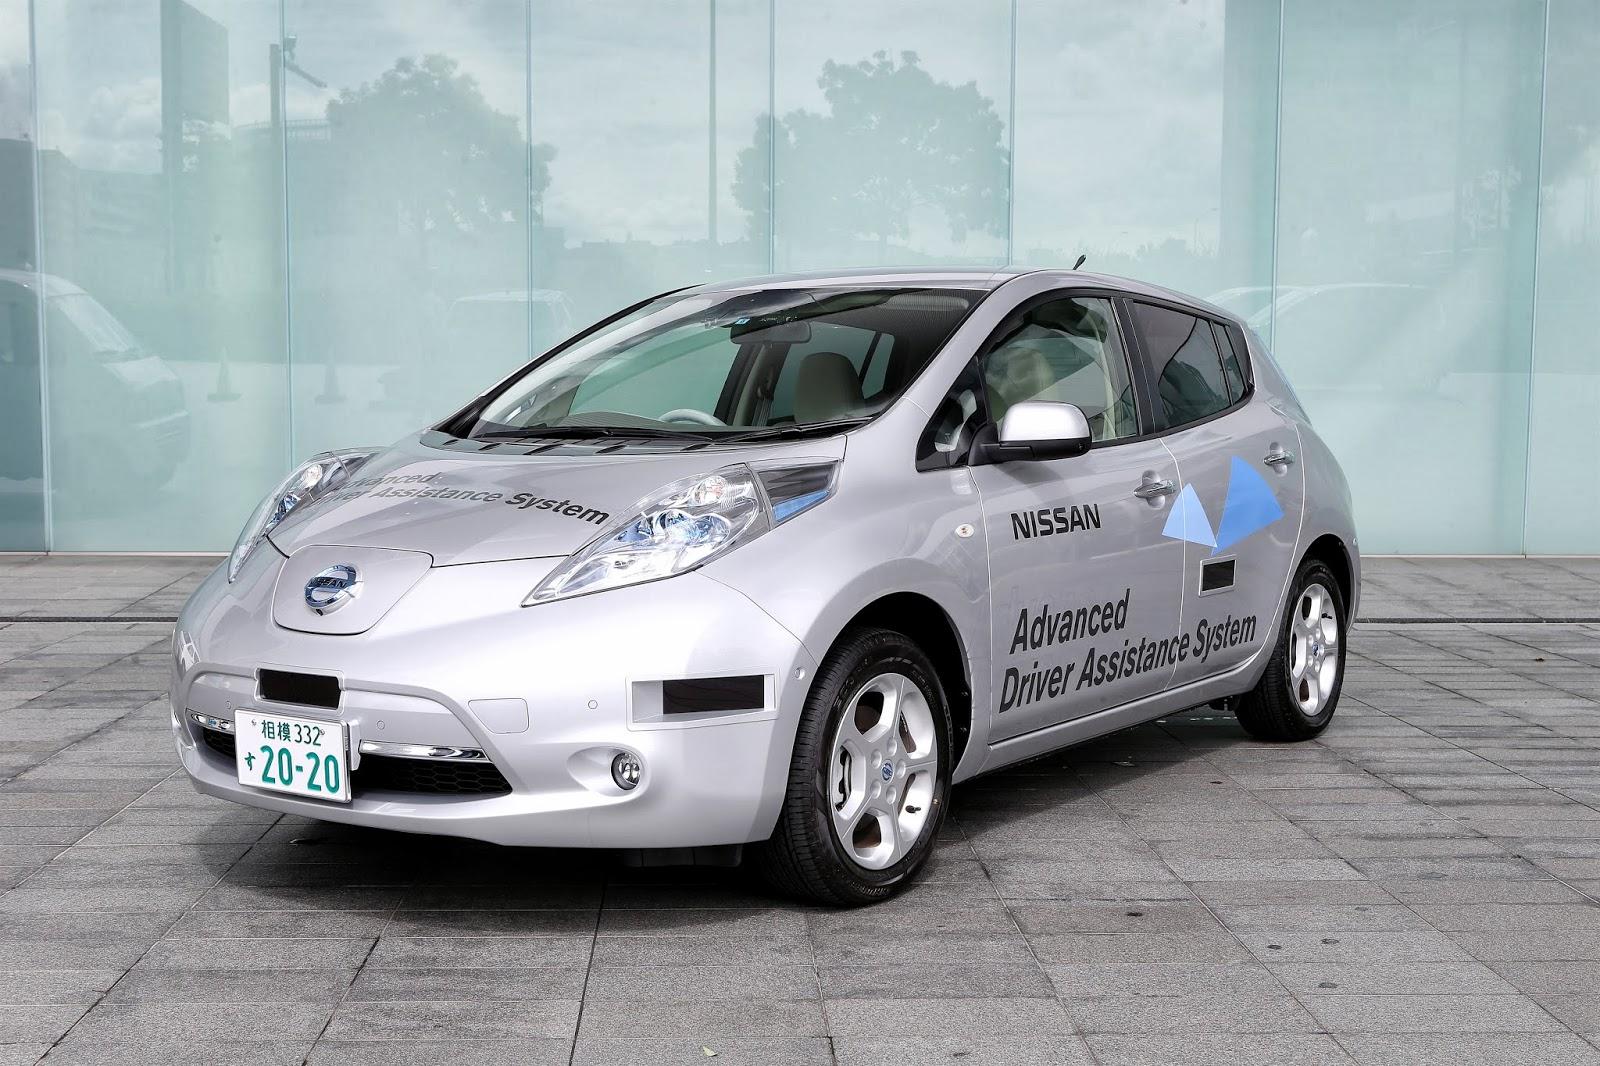 Autonomous Nissan Leaf Gets First License Plate For Public Road Testing